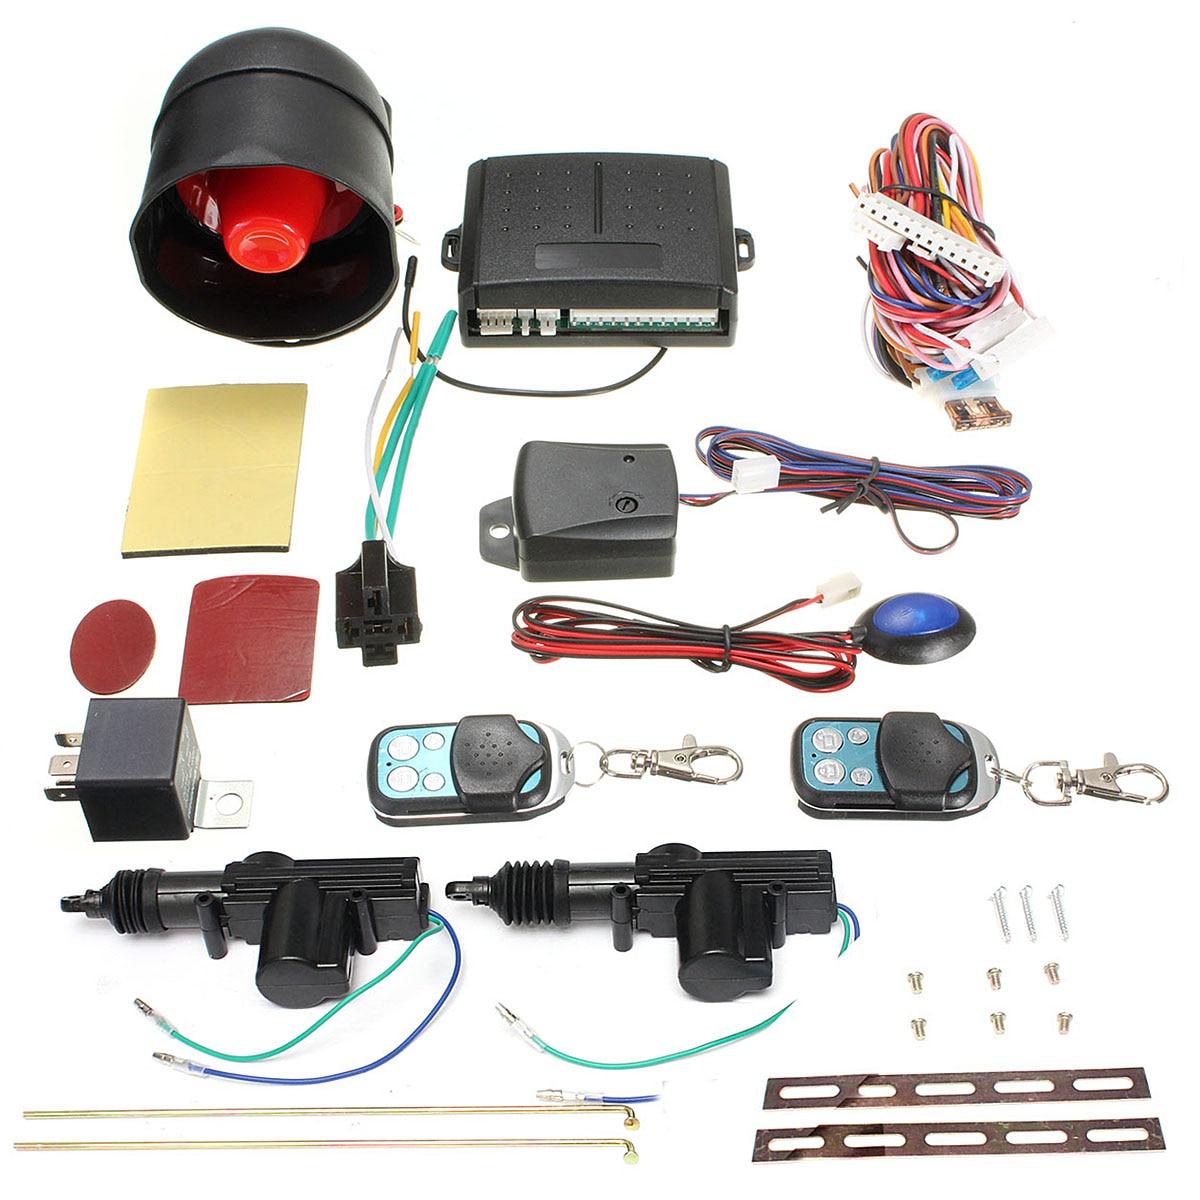 Conjunto de Sistemas de Alarme de Carro Auto Veículo Fechadura Da Porta Kit de Bloqueio Central Controlo Remoto Sistema de Entrada de Keyless Com Controladores Remotos